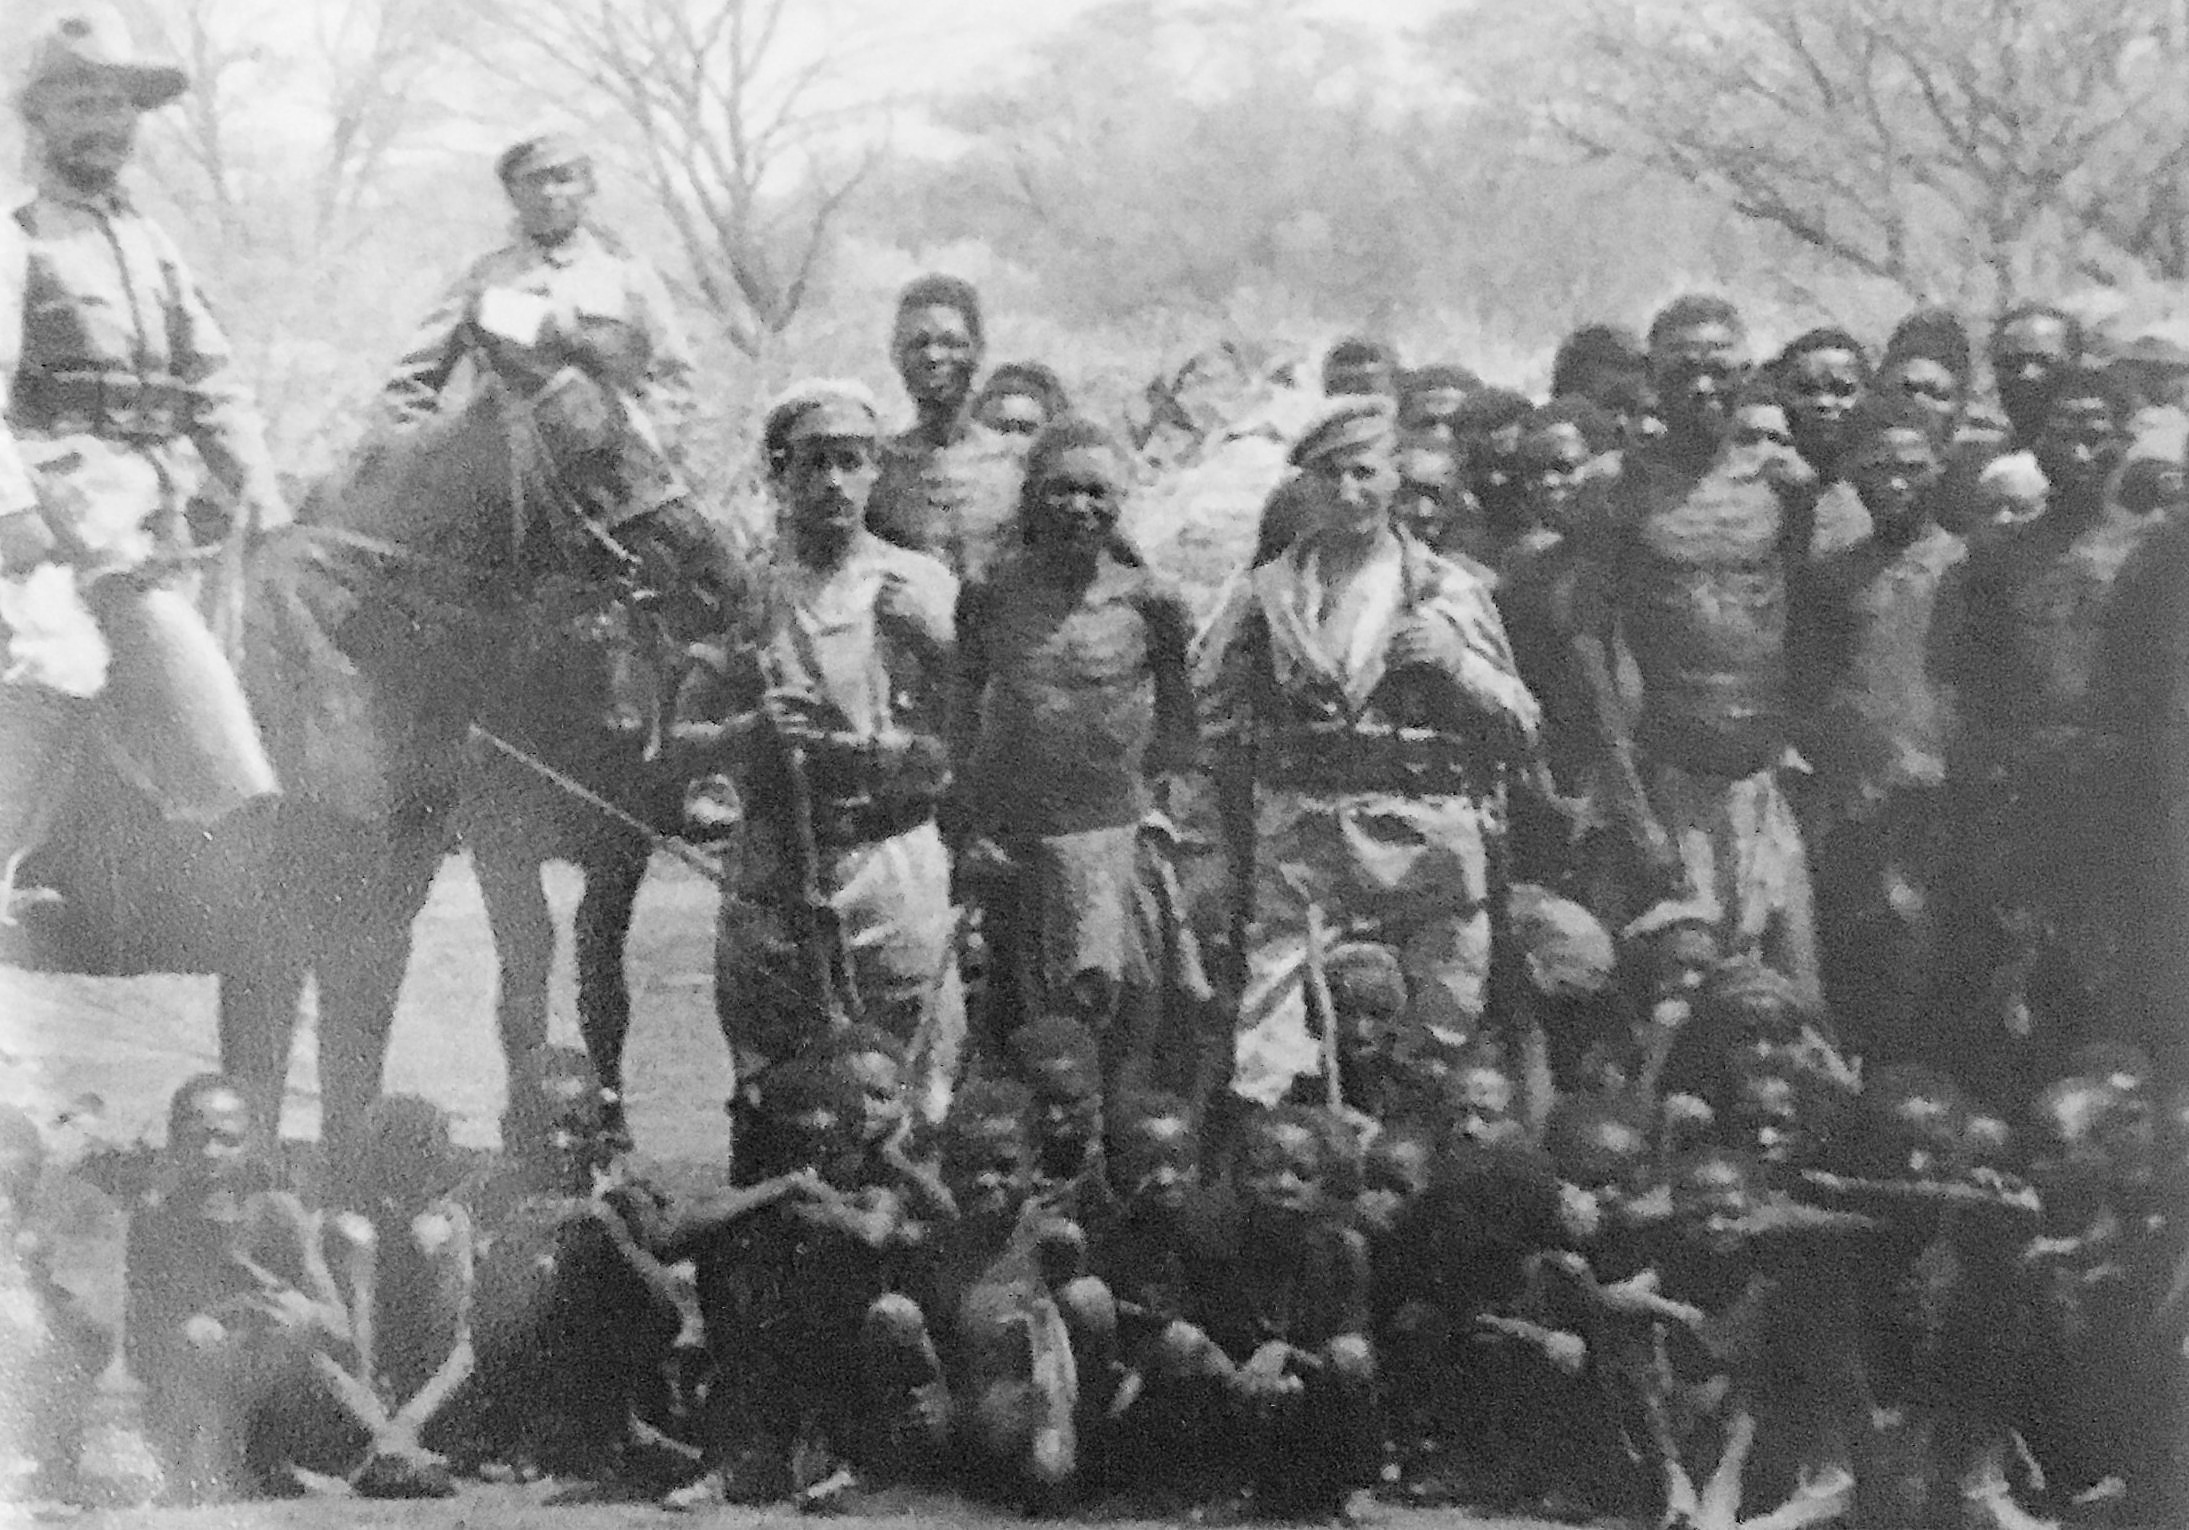 German colonial troops with prisoners in former German Southwest Africa.